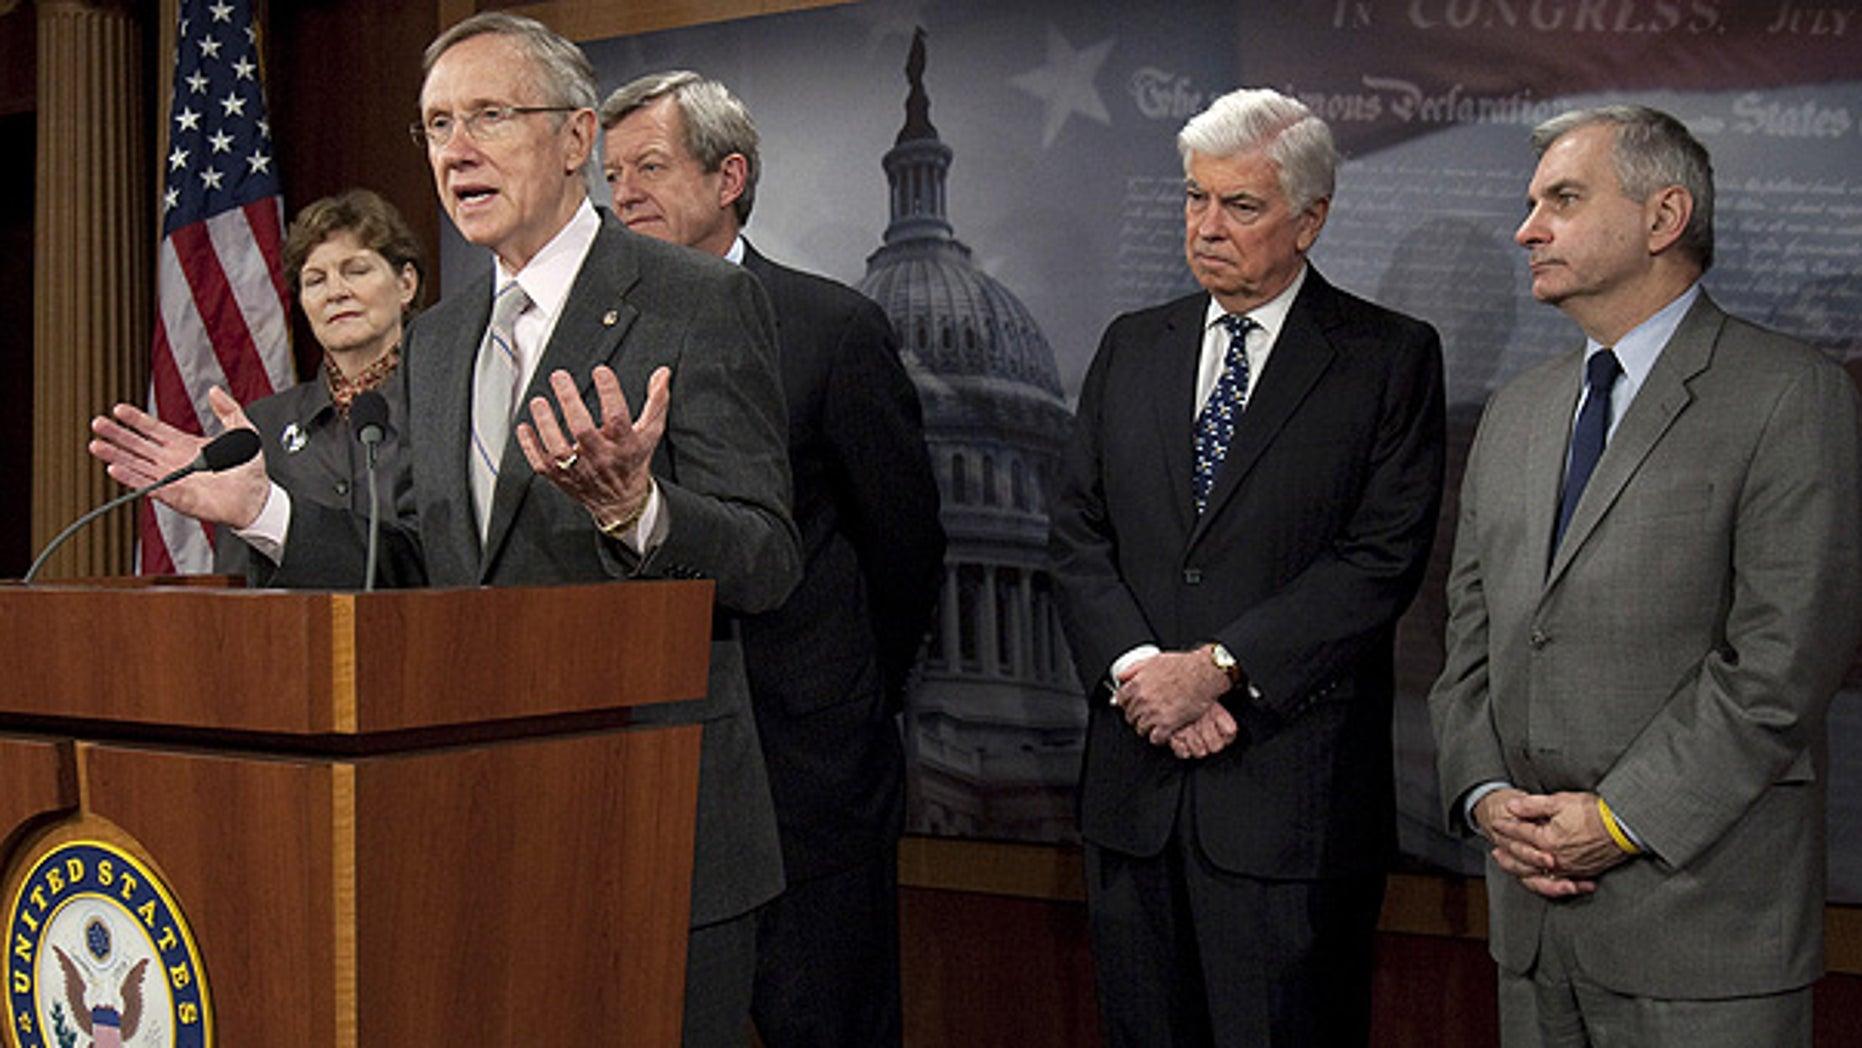 Nov. 4: Senate Majority Leader Harry Reid speaks as Sens. Jeanne Shaheen, Max Baucus, Chris Dodd, and Jack Reed listen on Capitol Hill. (AP)